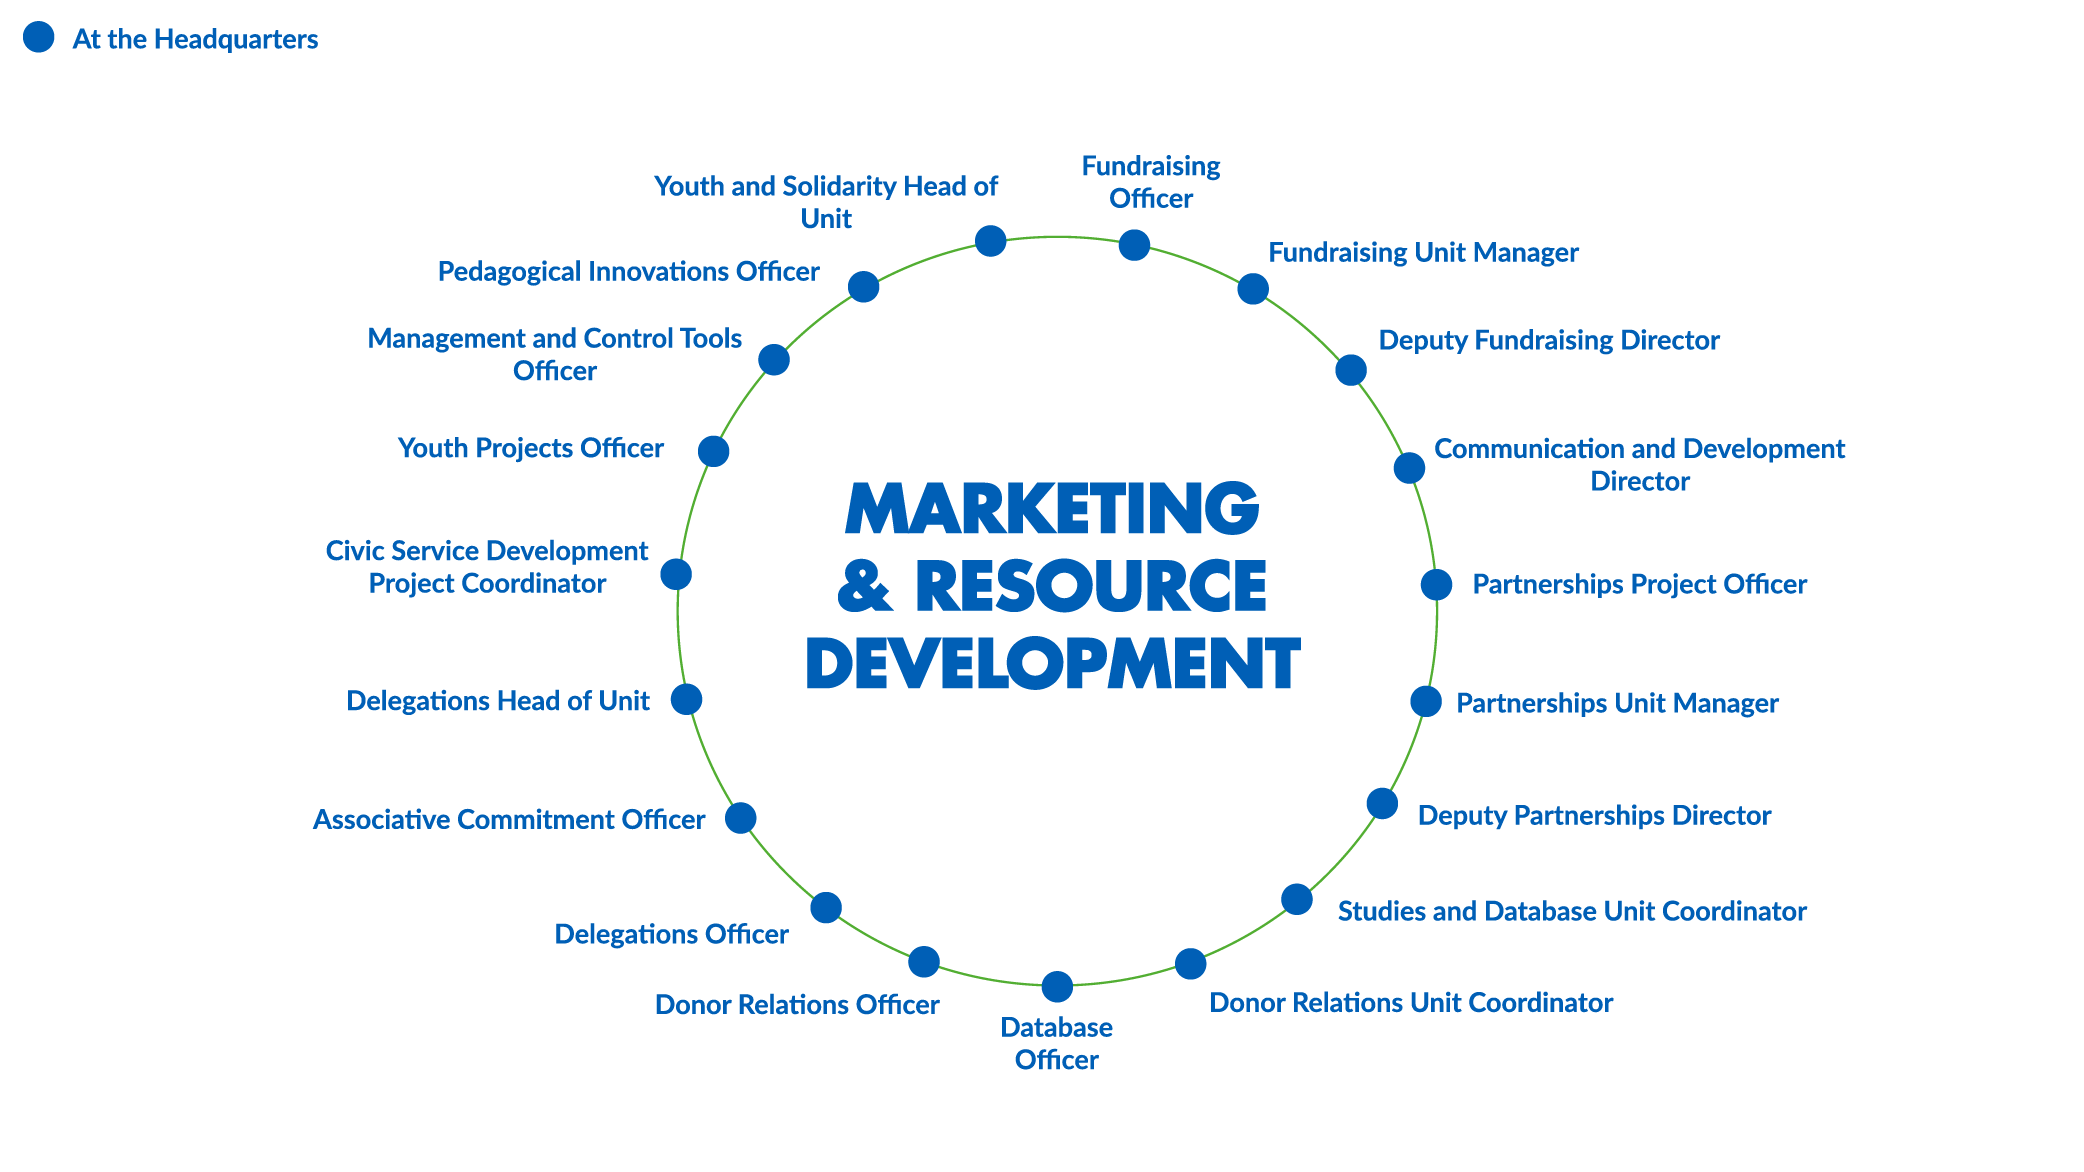 CARTOEN_Marketing & Resources dvpt